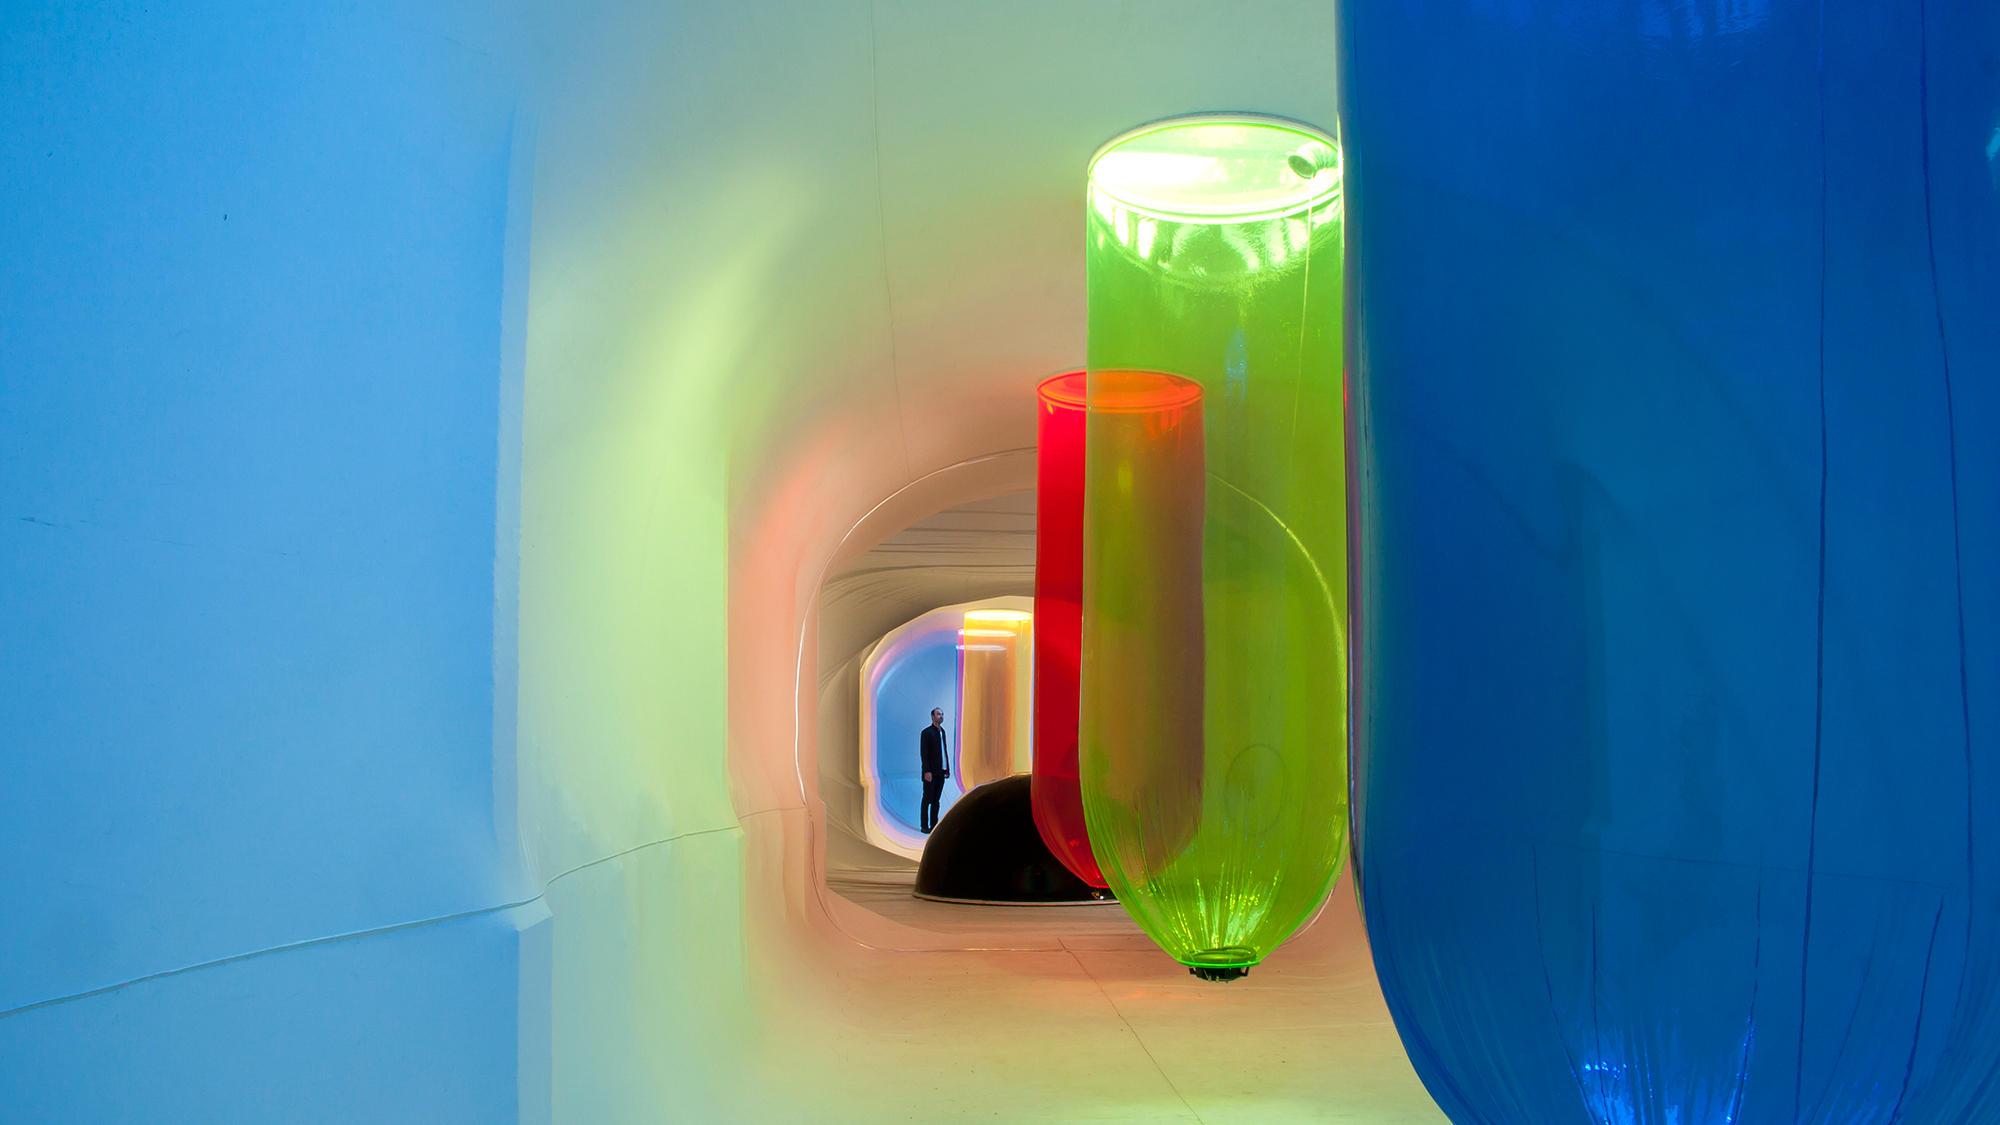 Marco Barotti - Sound of Light © MArco Barotti